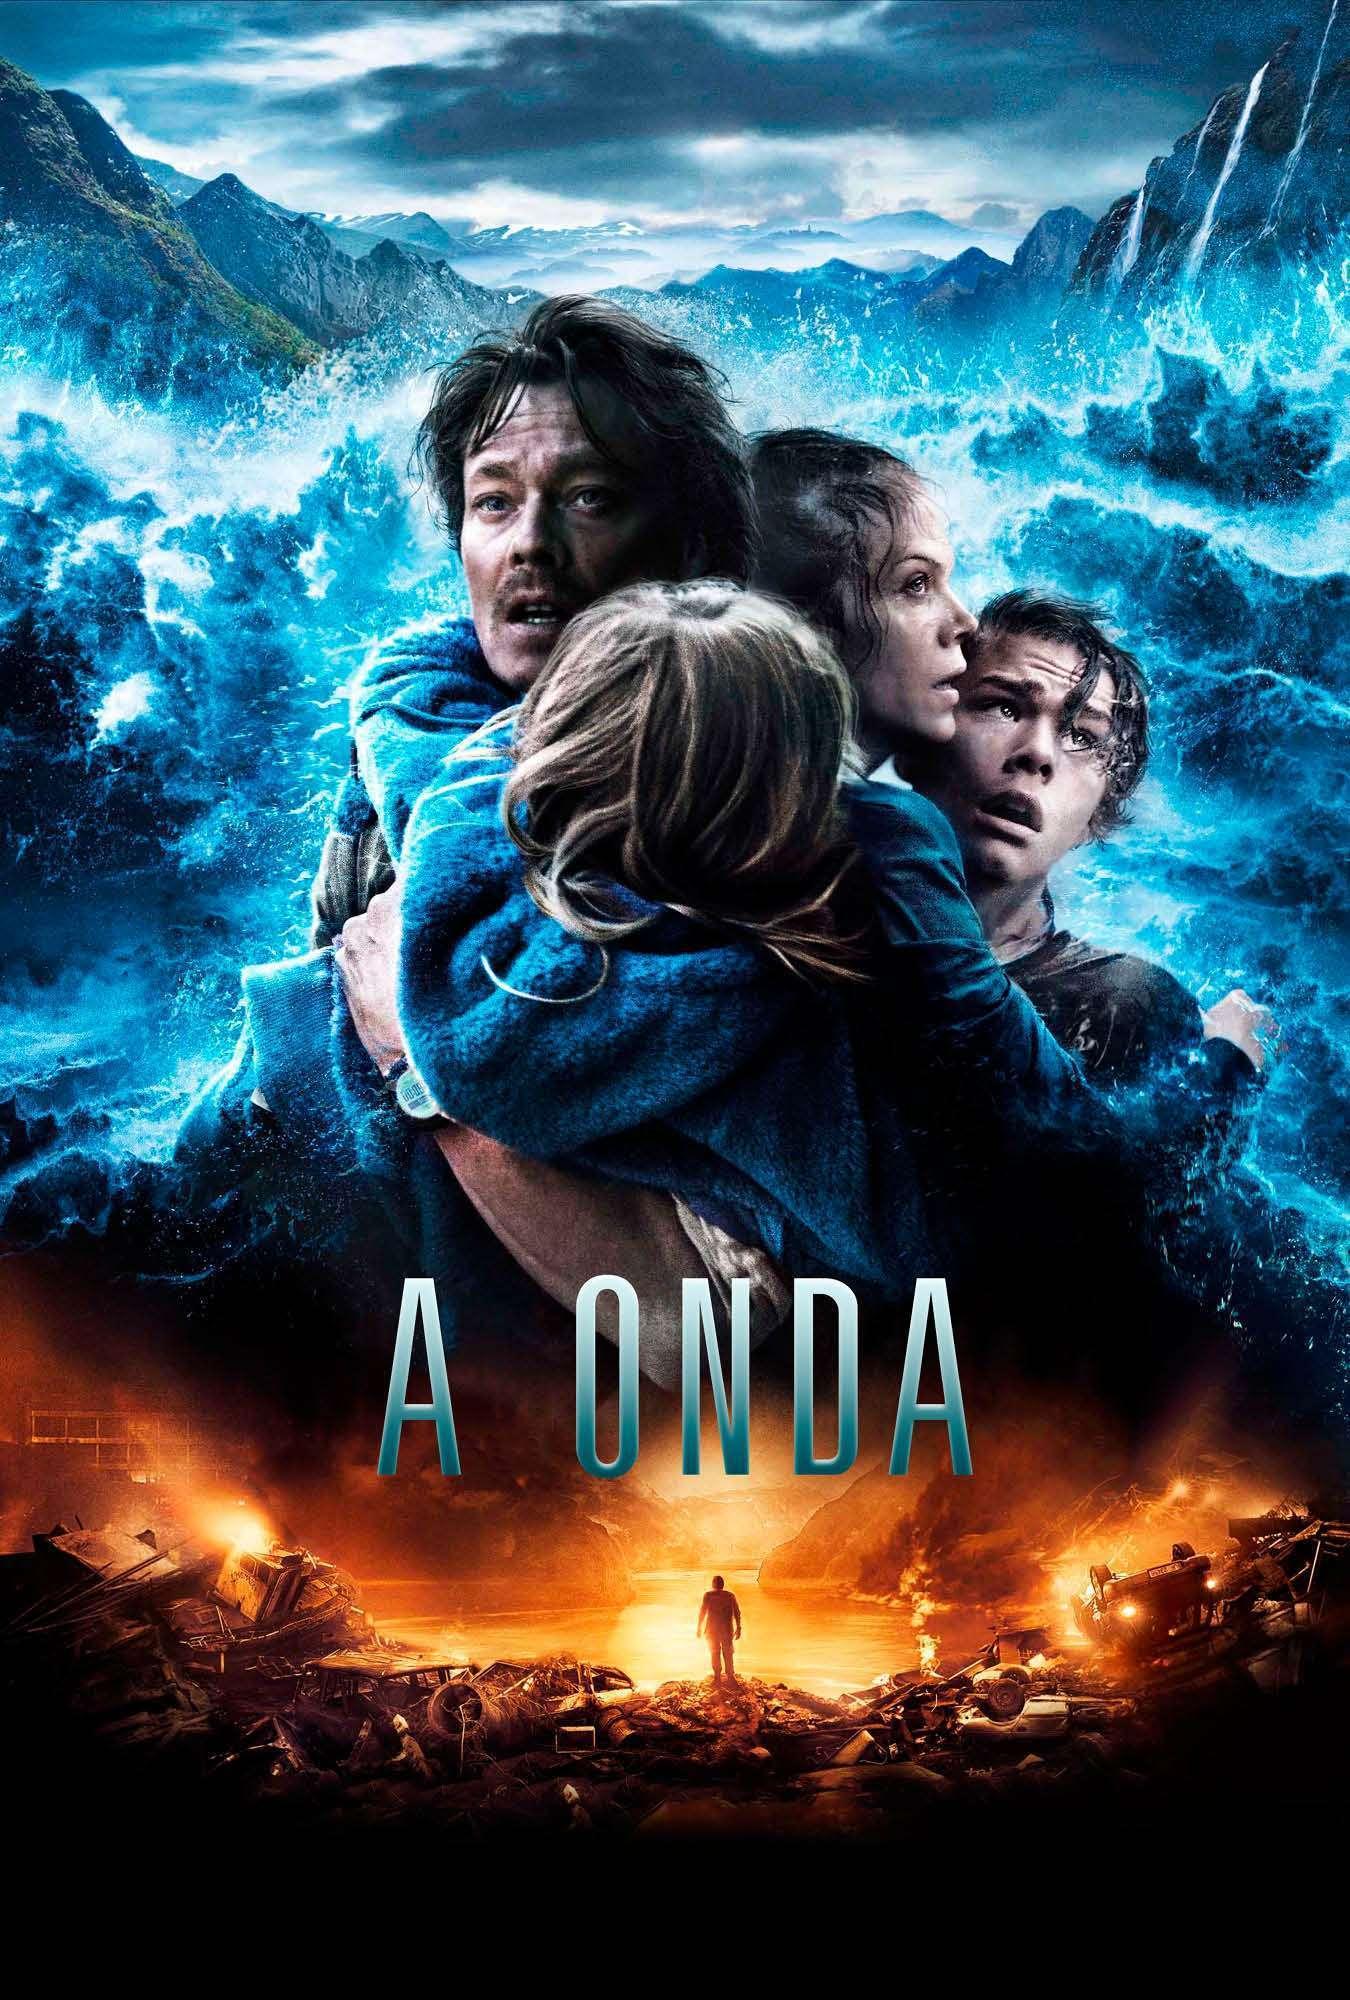 A Onda (The Wave) Trailer Oficial Legendado 2016 - YouTube